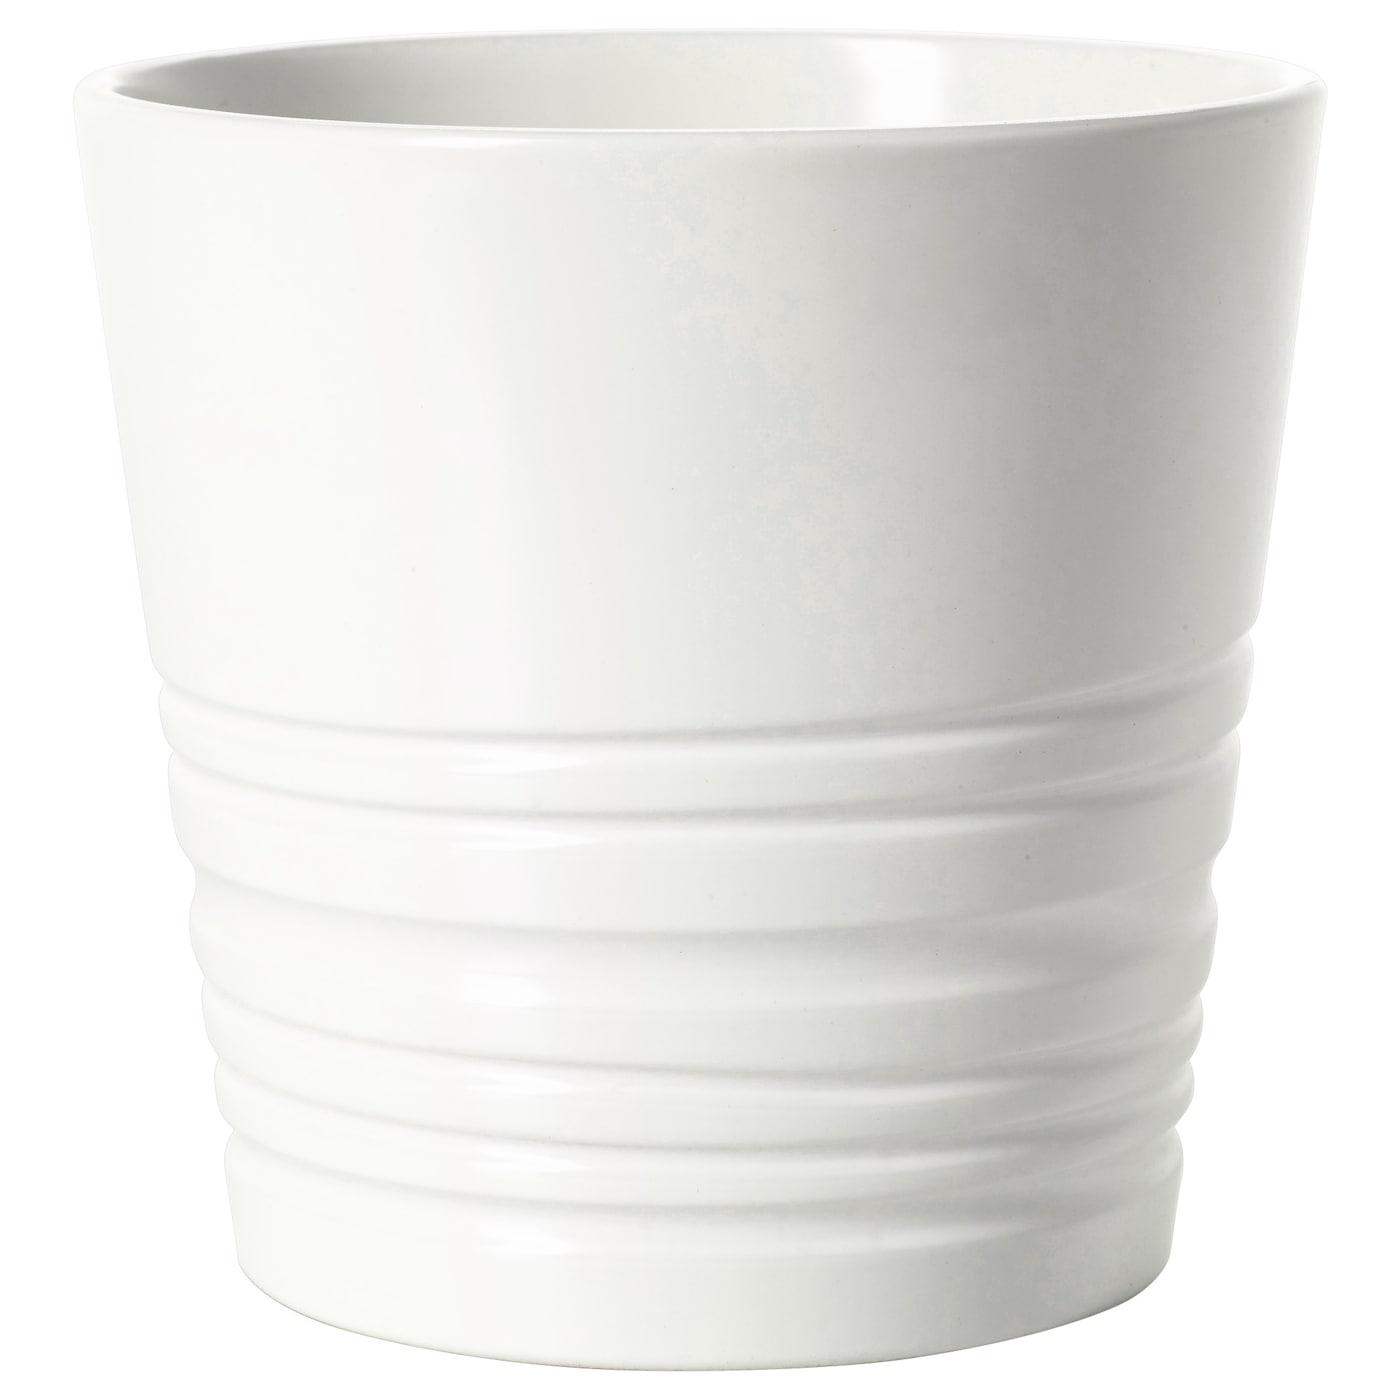 muskot cache pot blanc 9 cm ikea. Black Bedroom Furniture Sets. Home Design Ideas